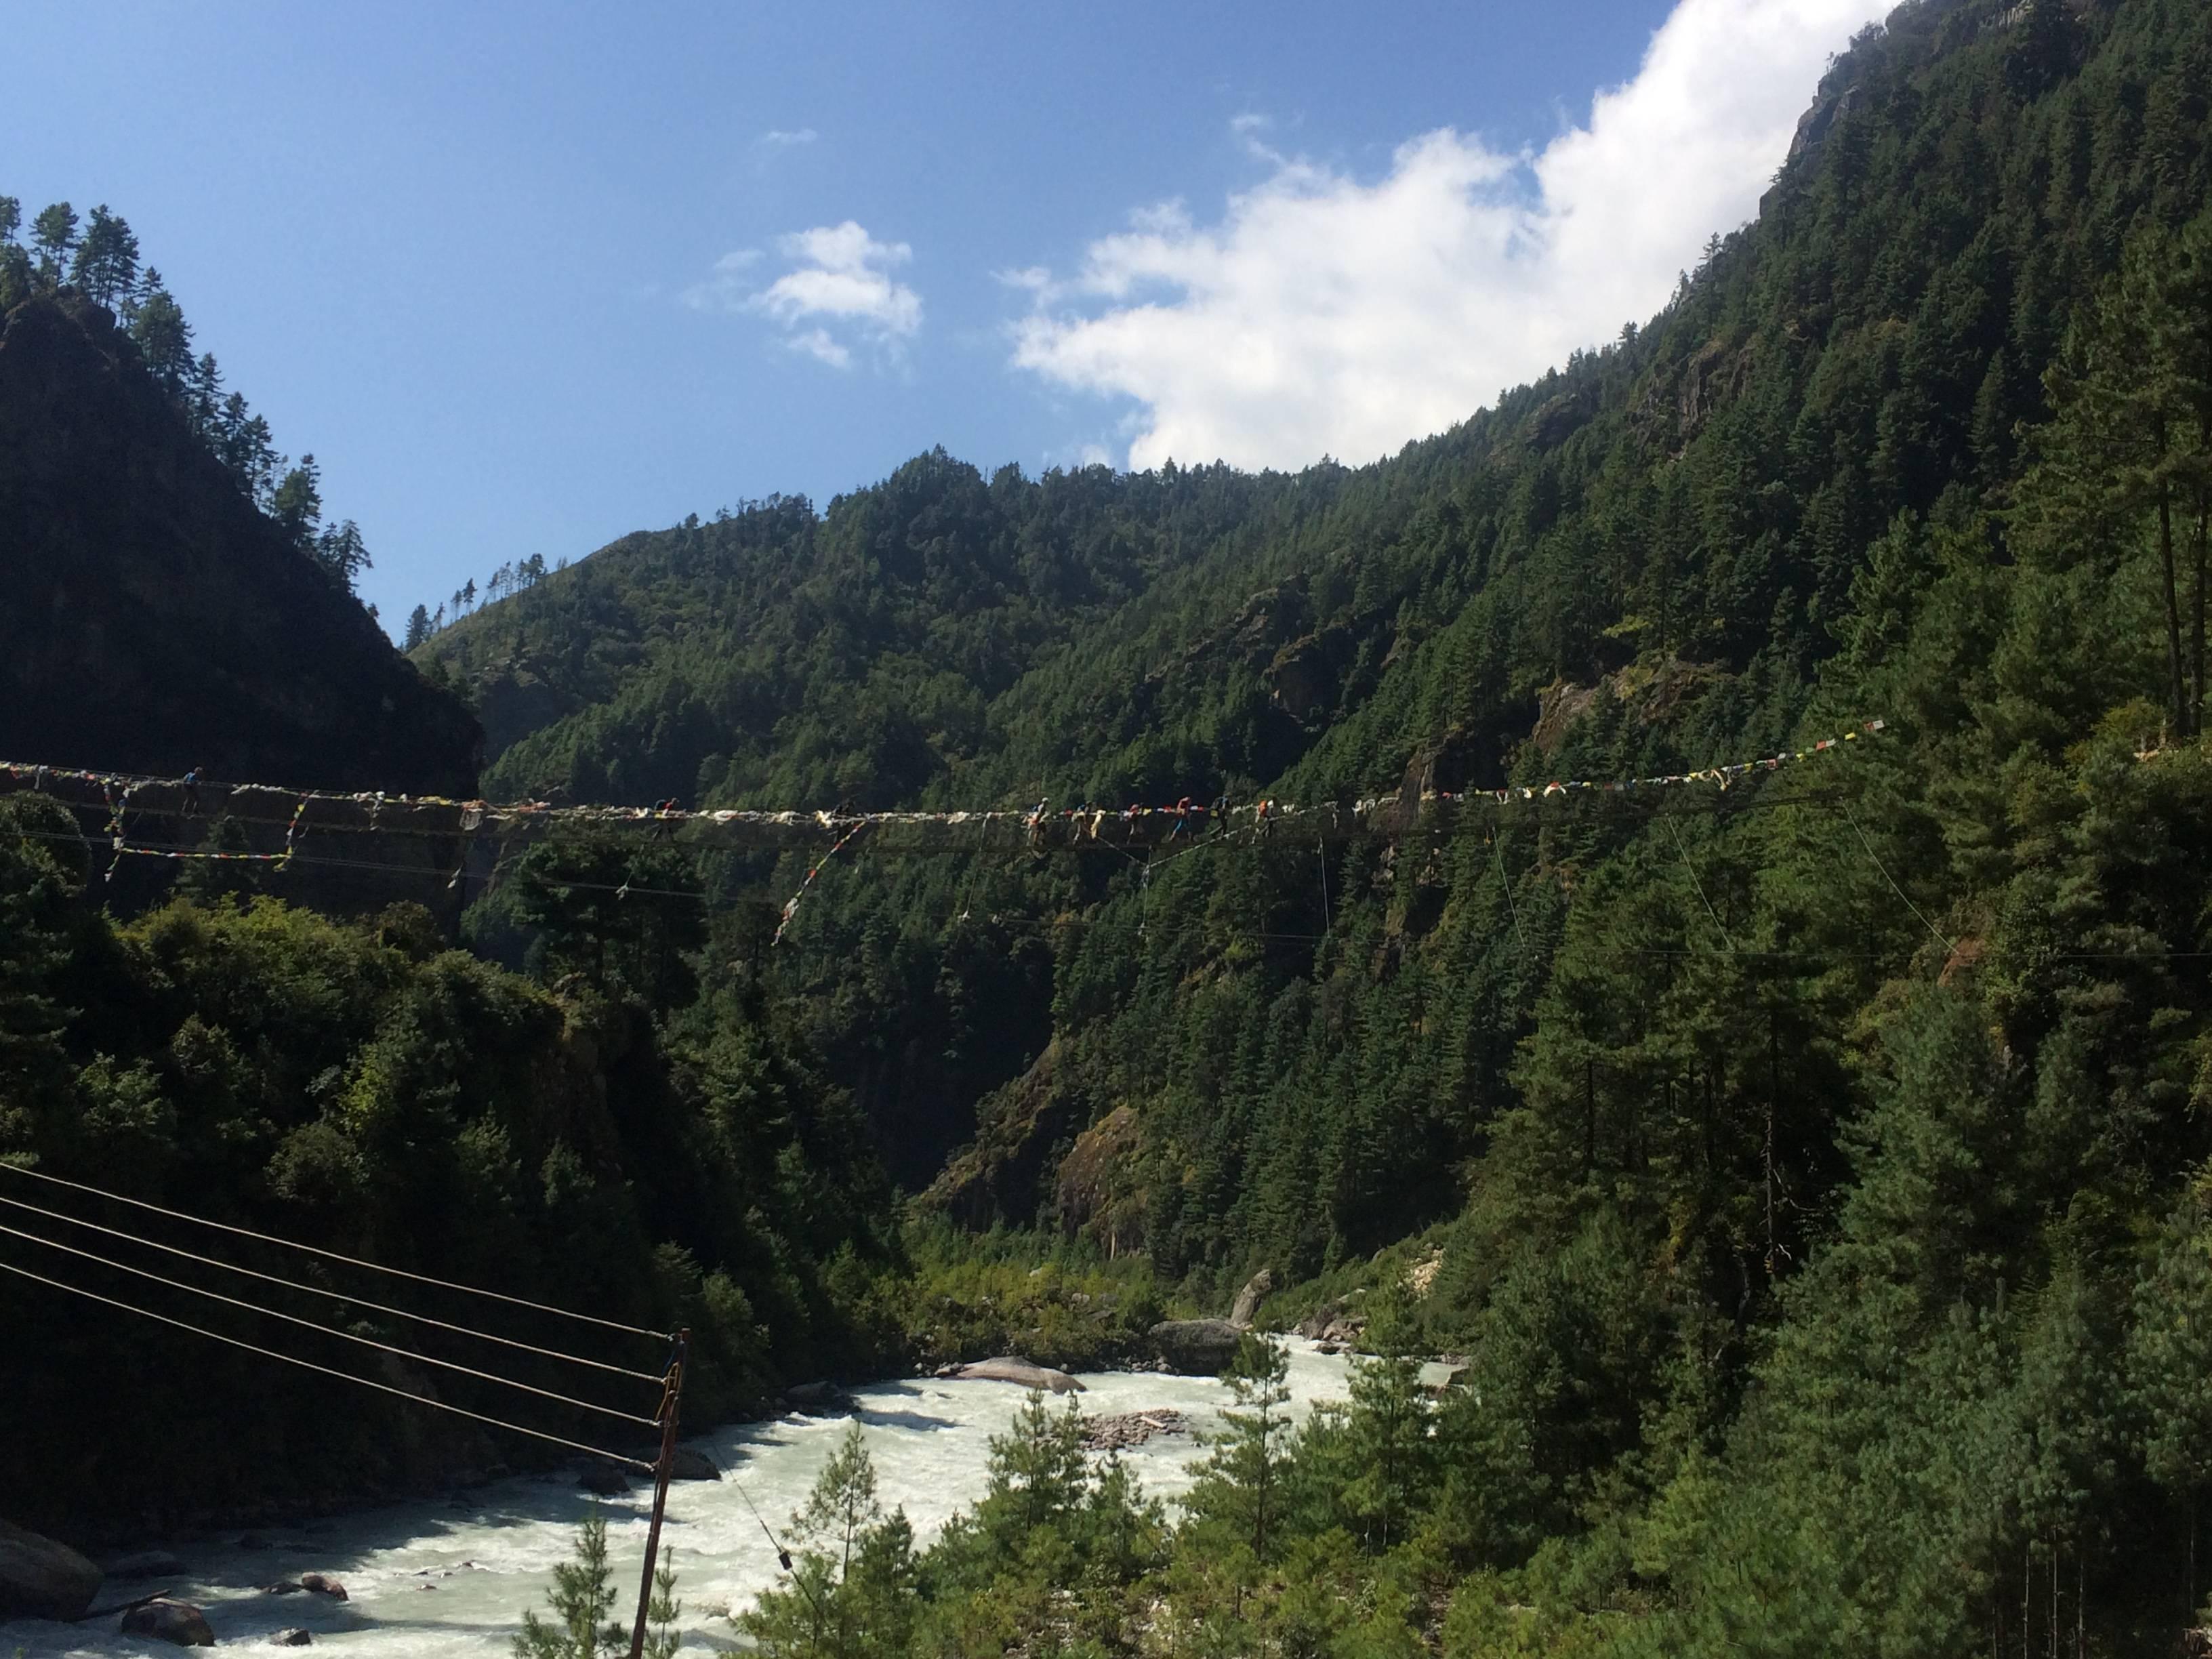 Bridge crossings